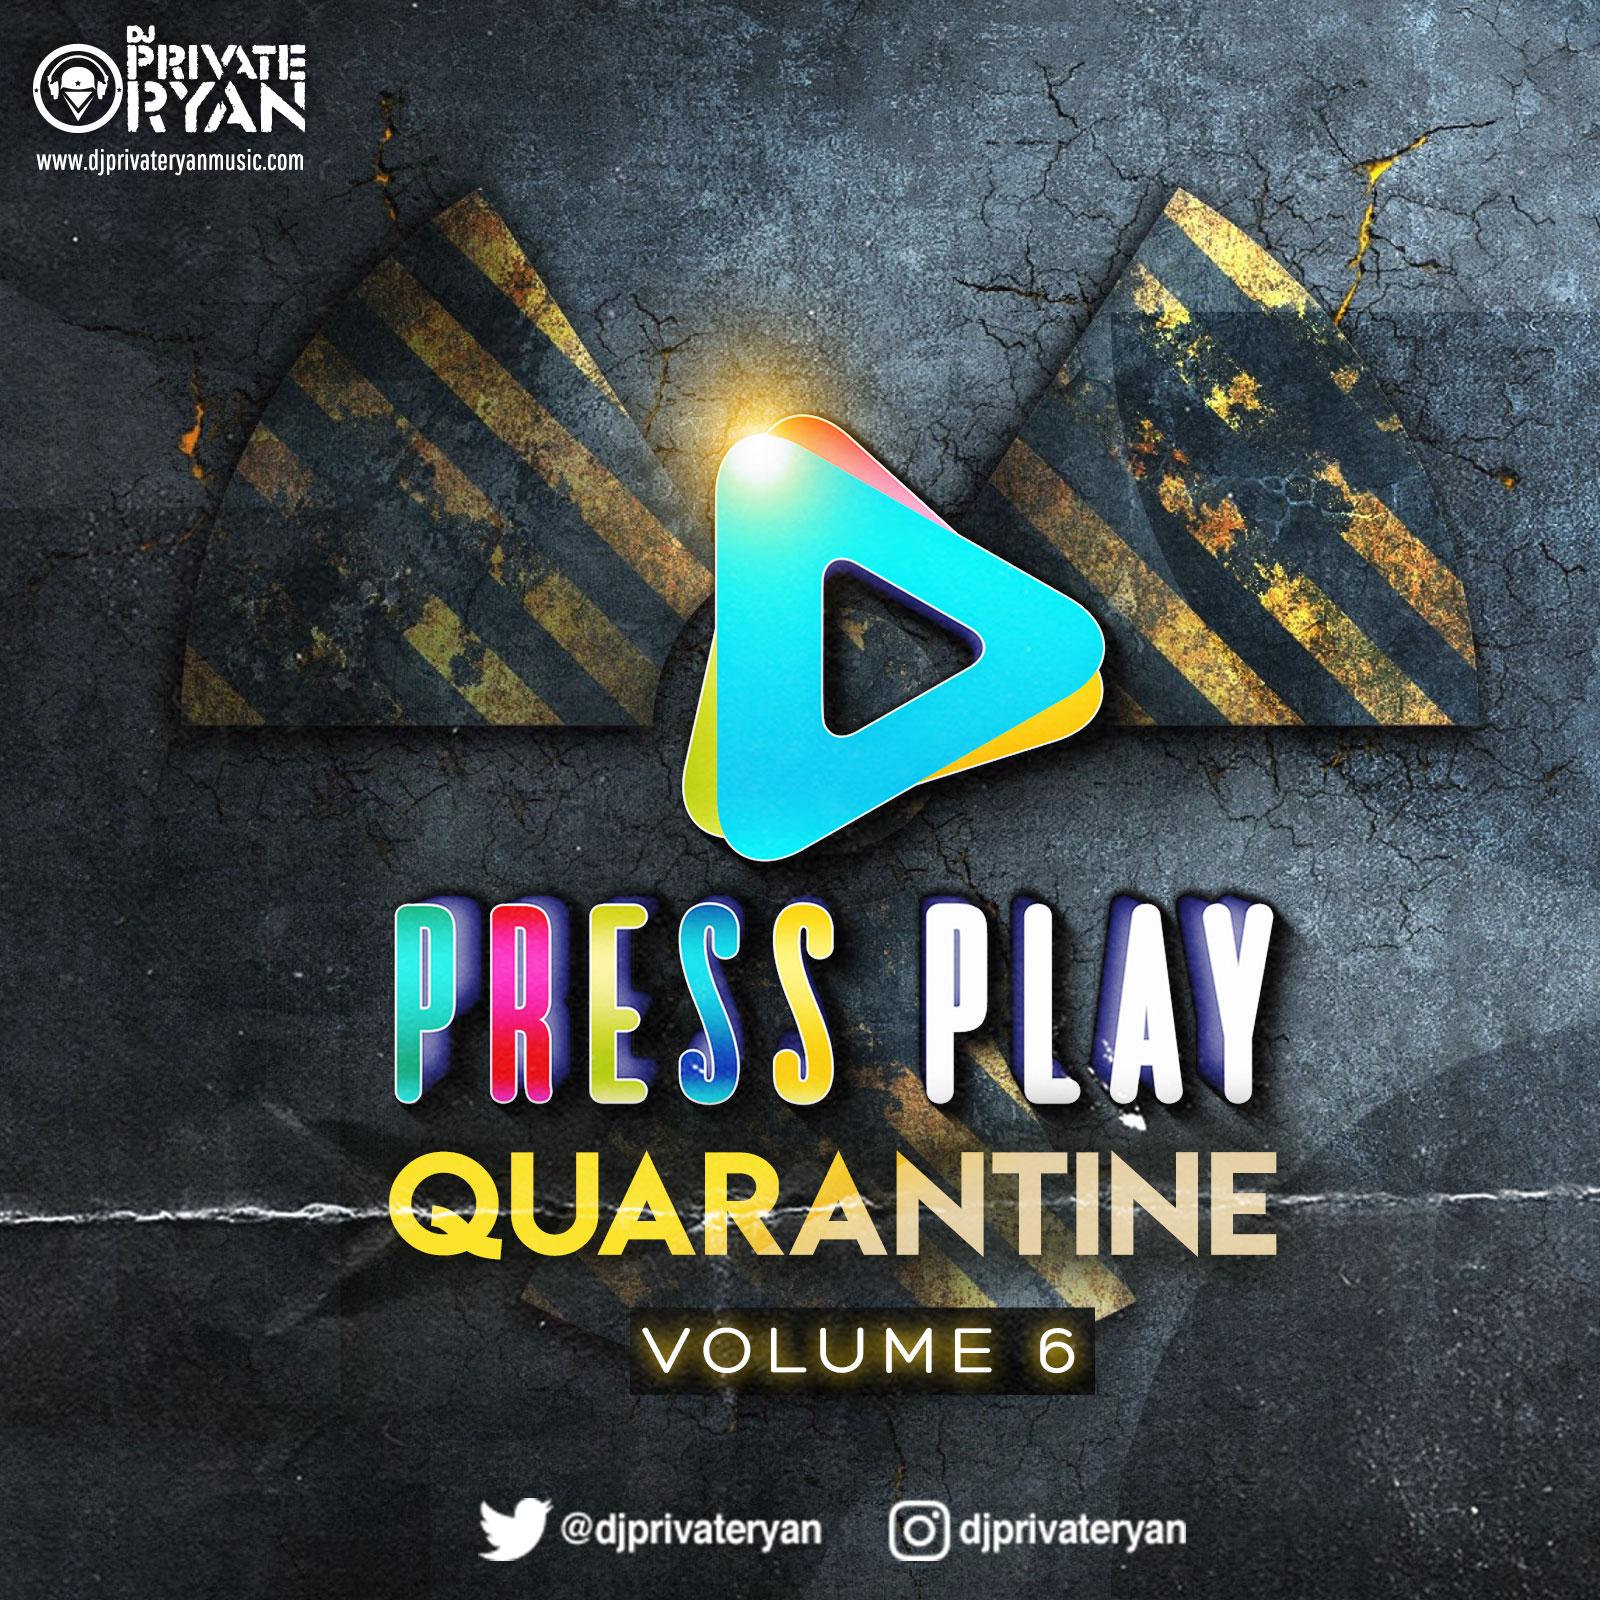 Private Ryan Presents Press Play Quarantine Volume 6 (The Blend Up) clean